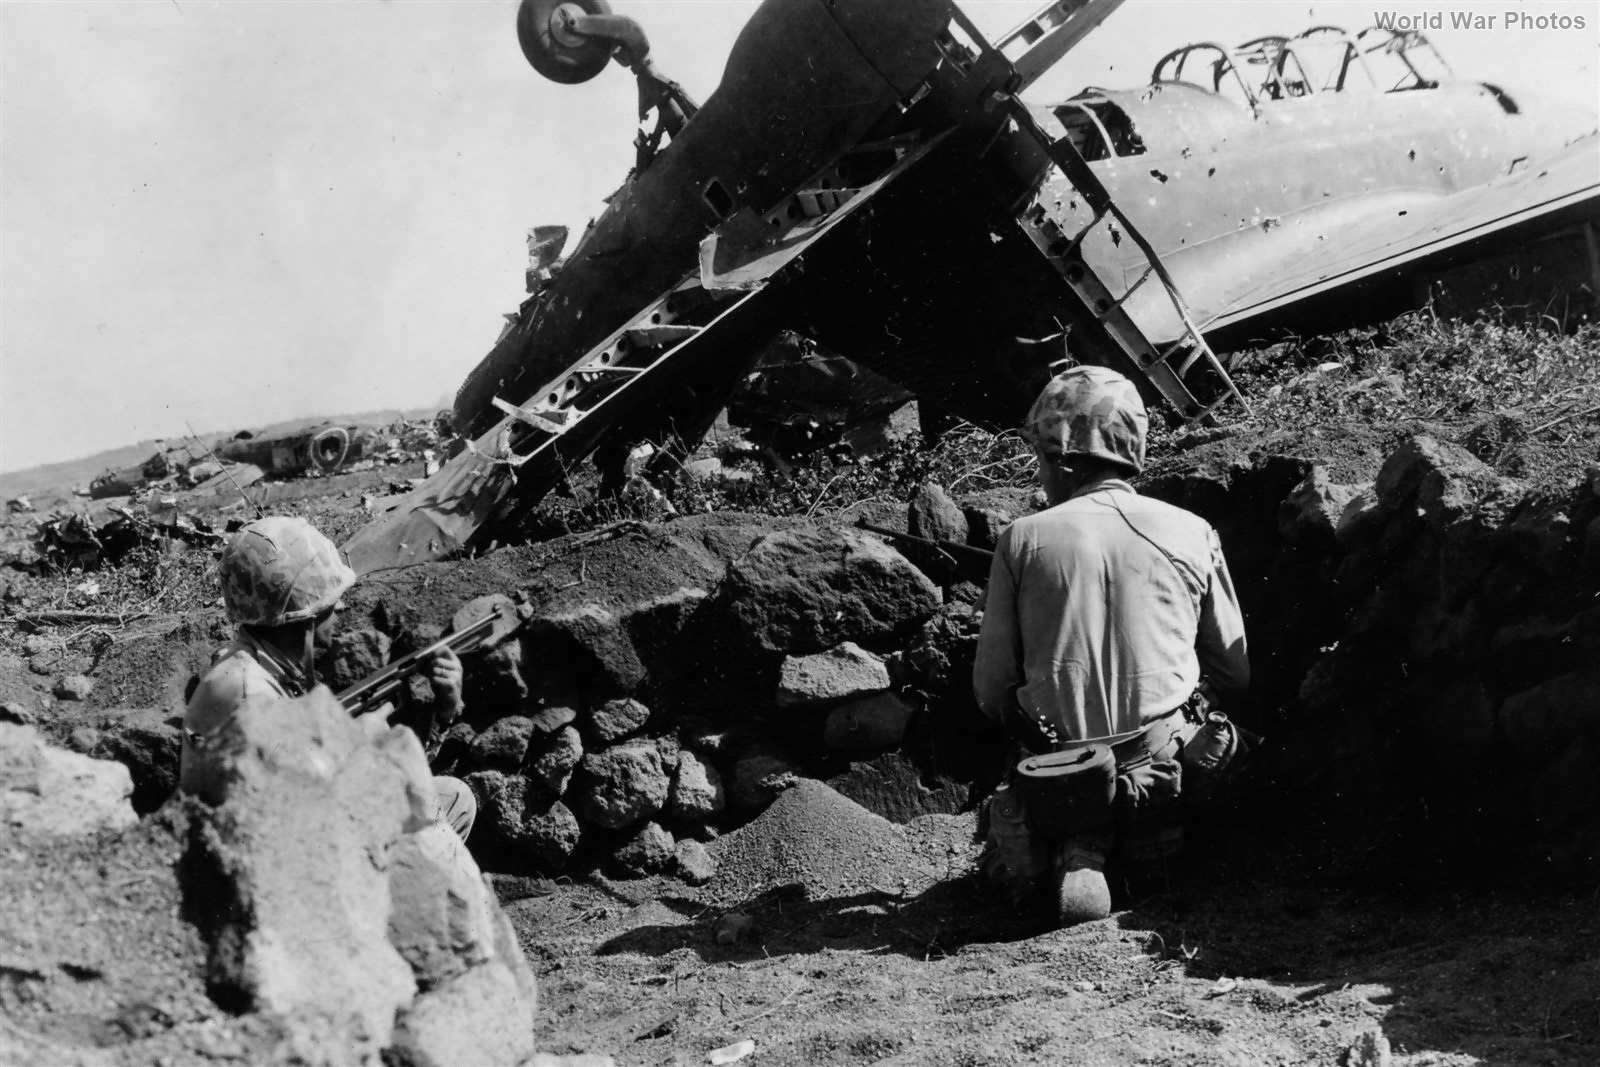 Marines on Airfield 1 Iwo Jima